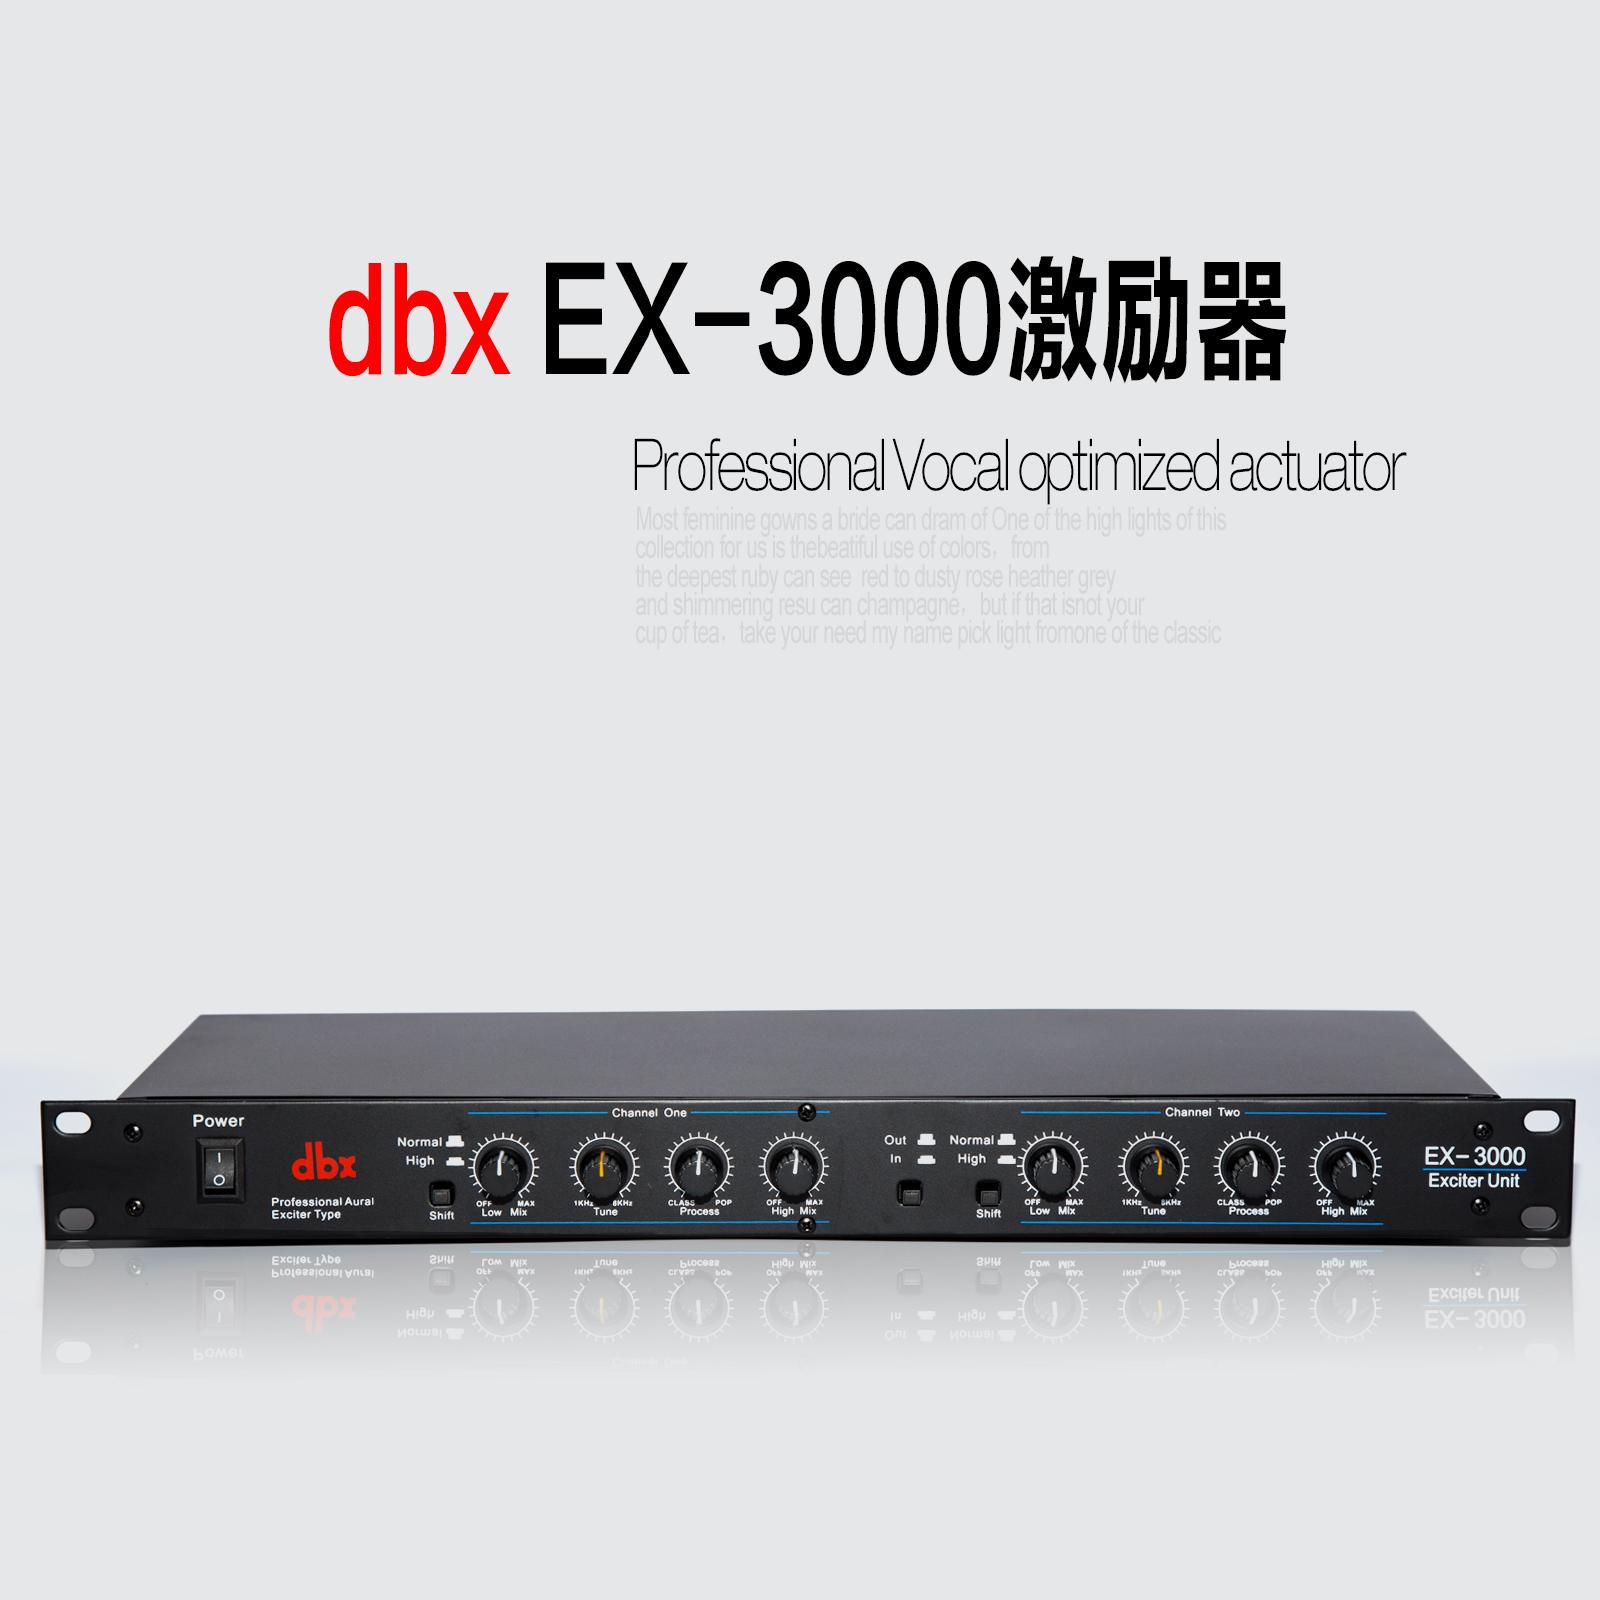 EX-3000话筒专业激励器人声乐器声音优化器专业舞台会议工程音响